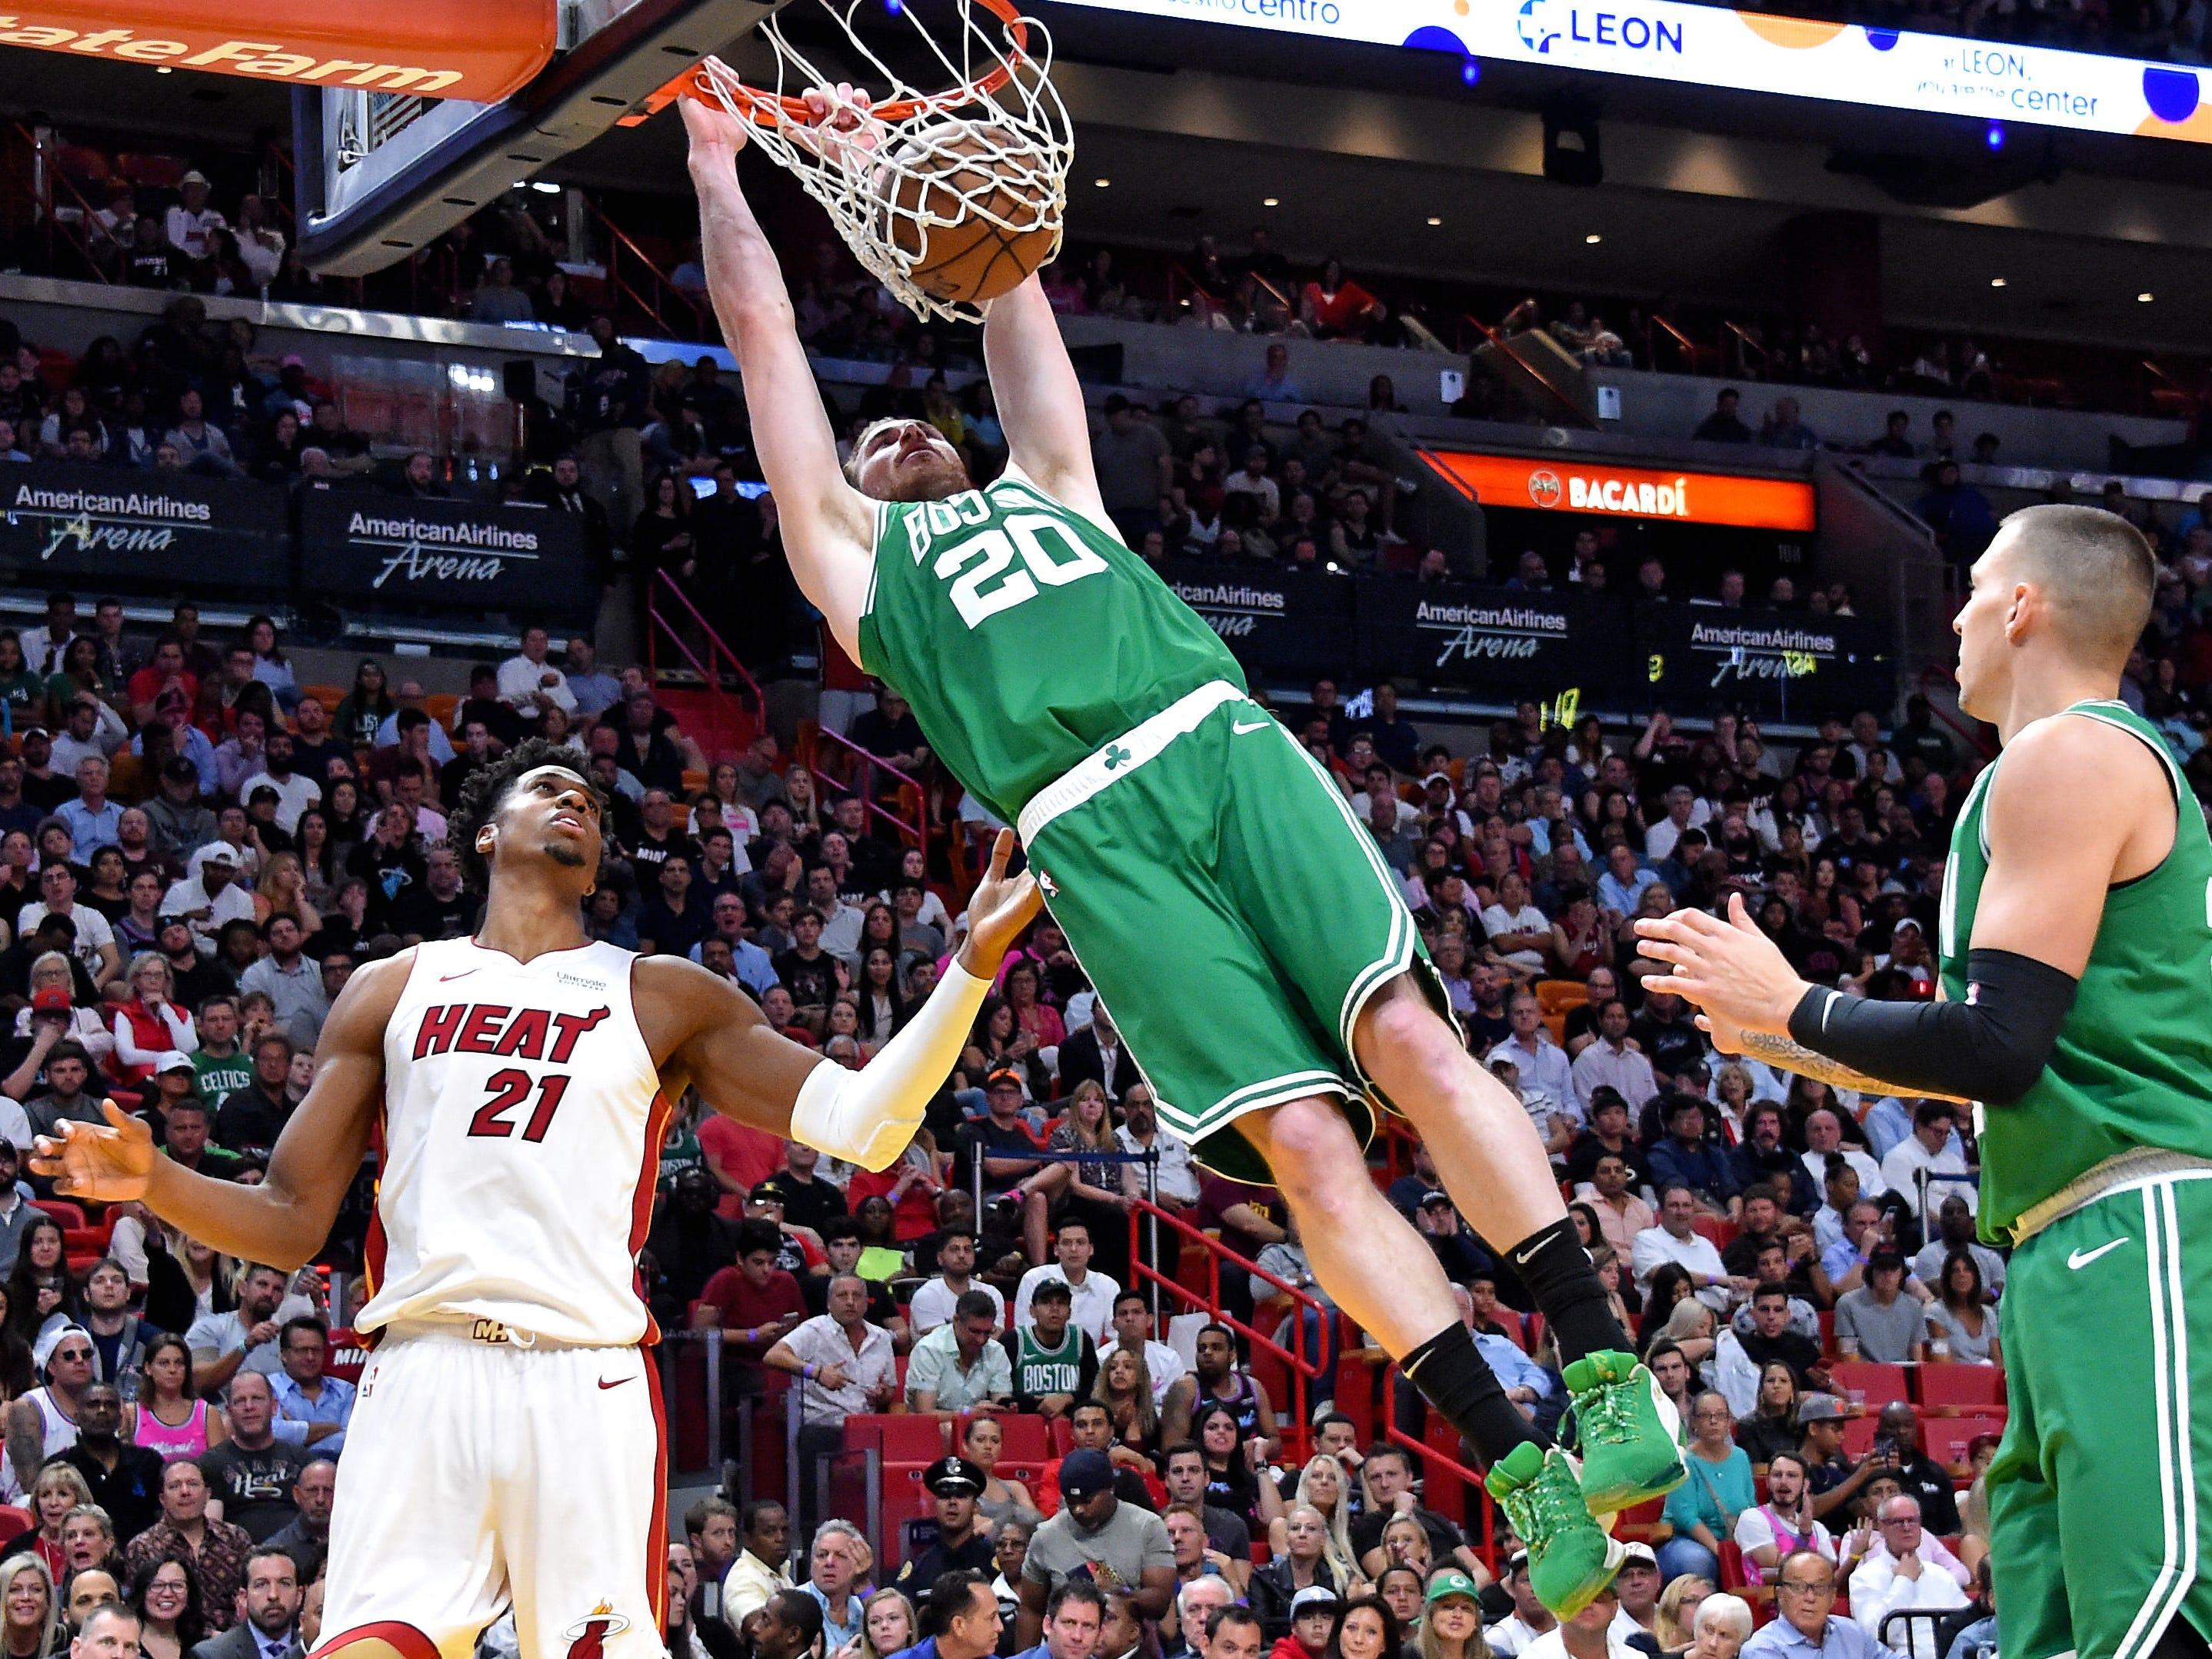 April 3: Boston Celtics forward Gordon Hayward dunks the ball against the Miami Heat.